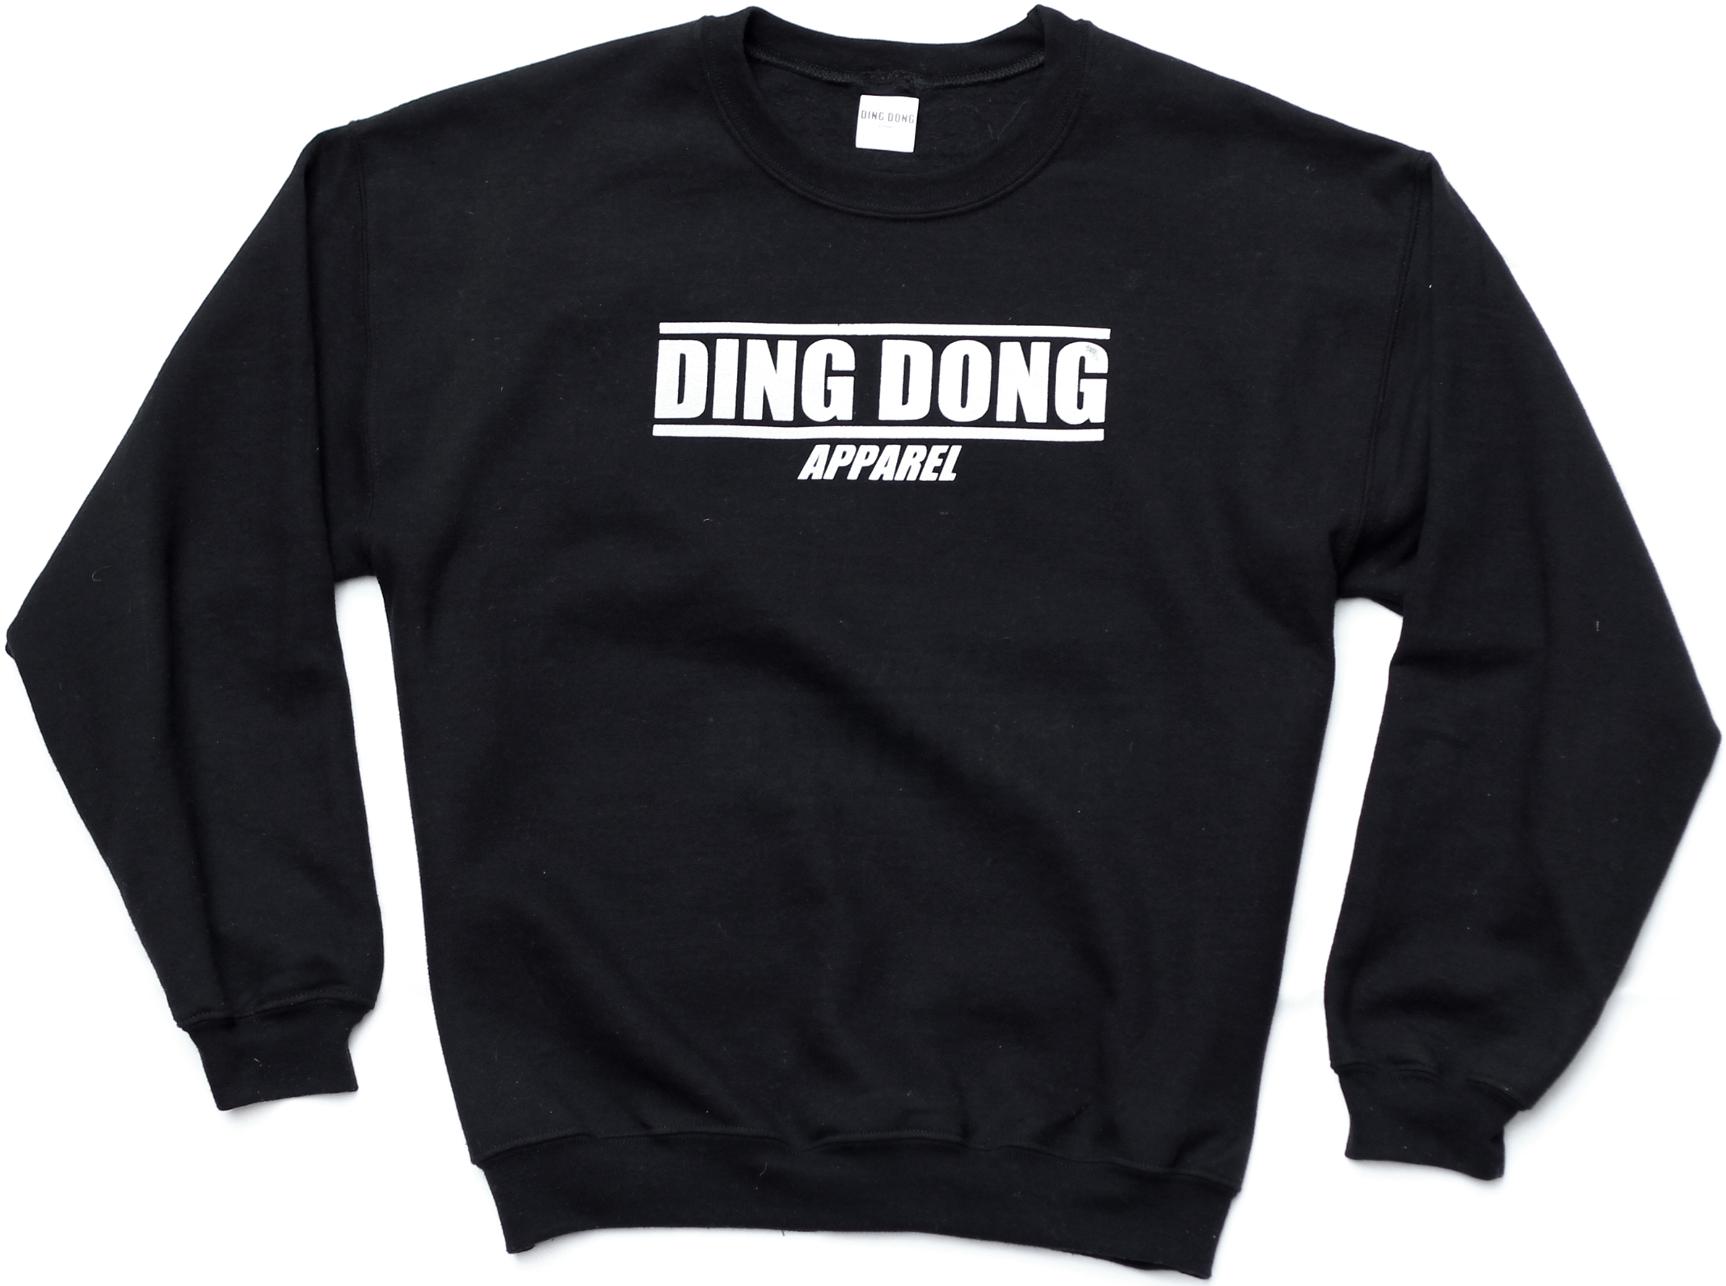 Large Print Sweatshirt - Black 00002